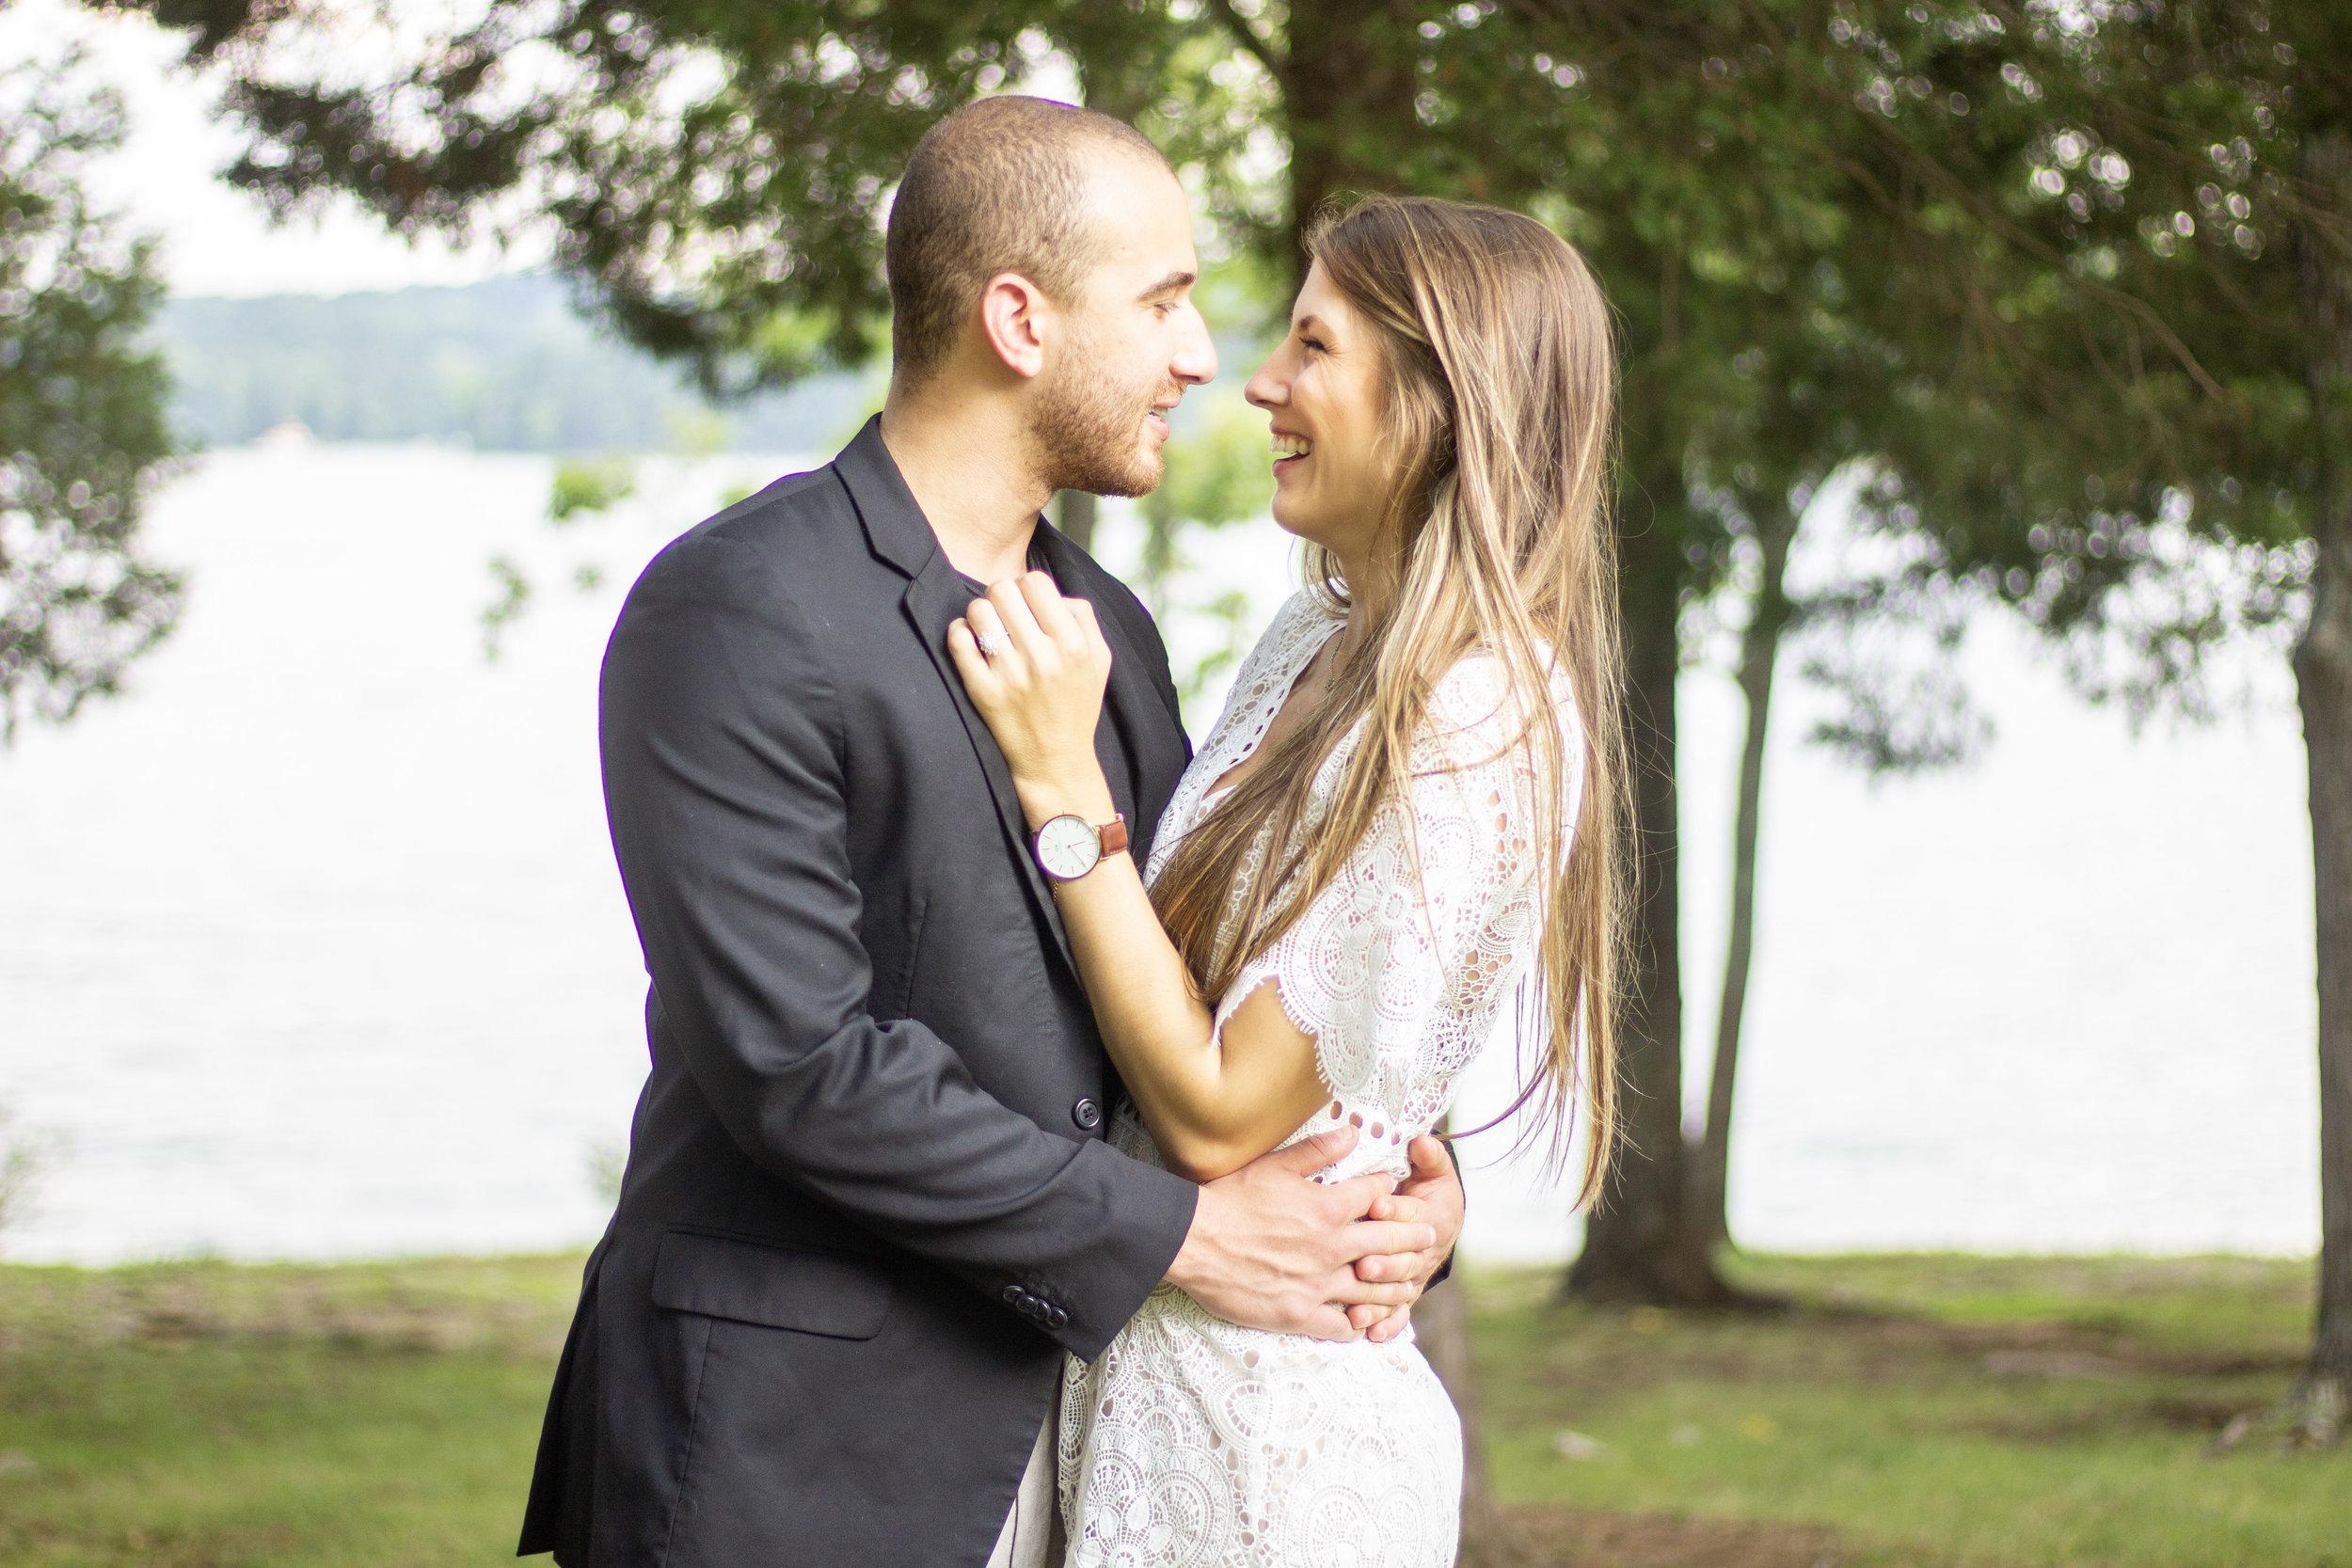 Olivia Shea Style, Proposal Story, Couple.jpg